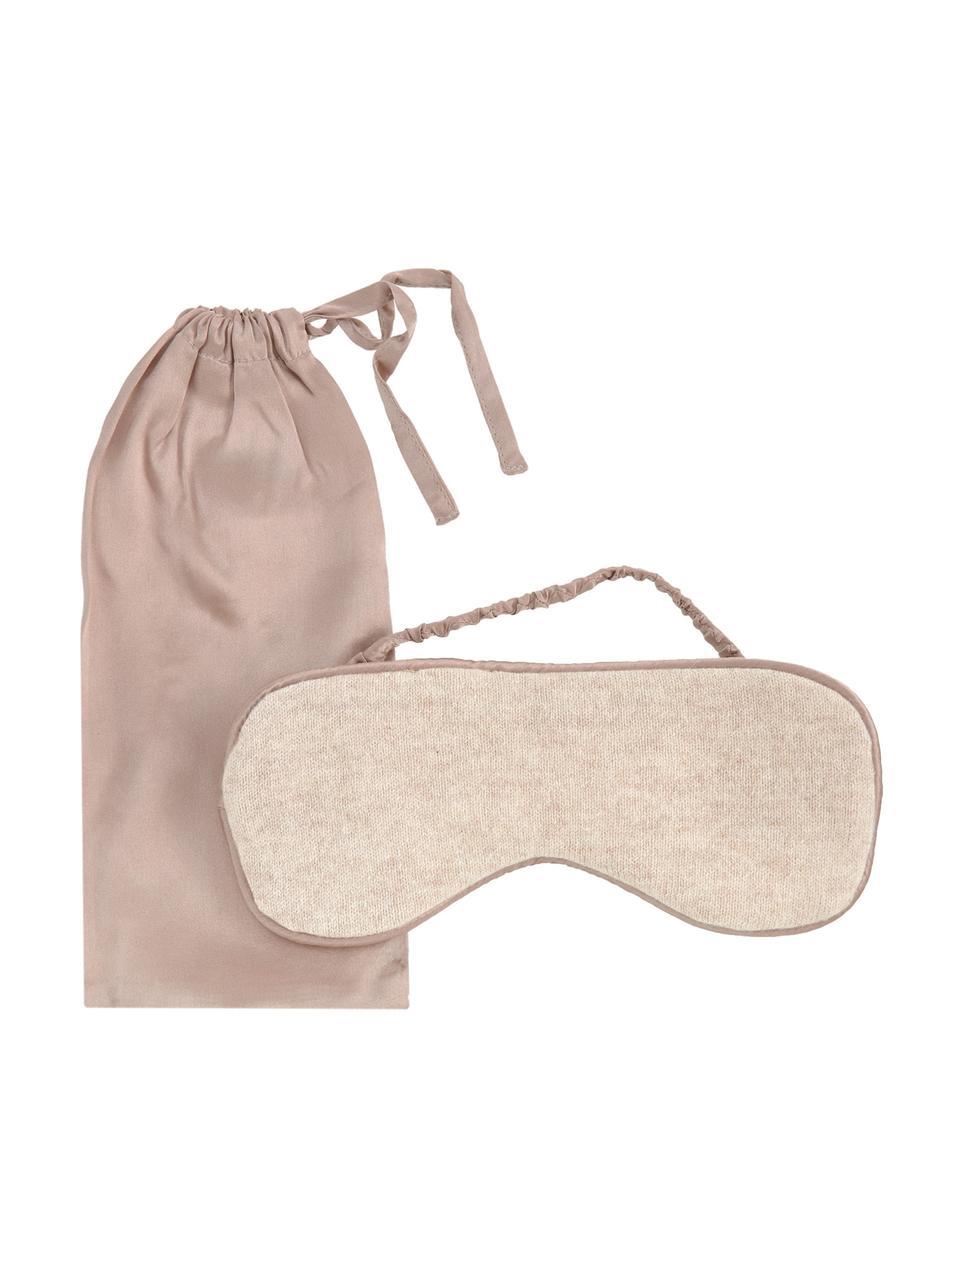 Maschera da notte in seta Silke, Interno: 100% seta, Cinturino: 100% seta, Beige, taupe, Larg. 21 x Alt. 9 cm